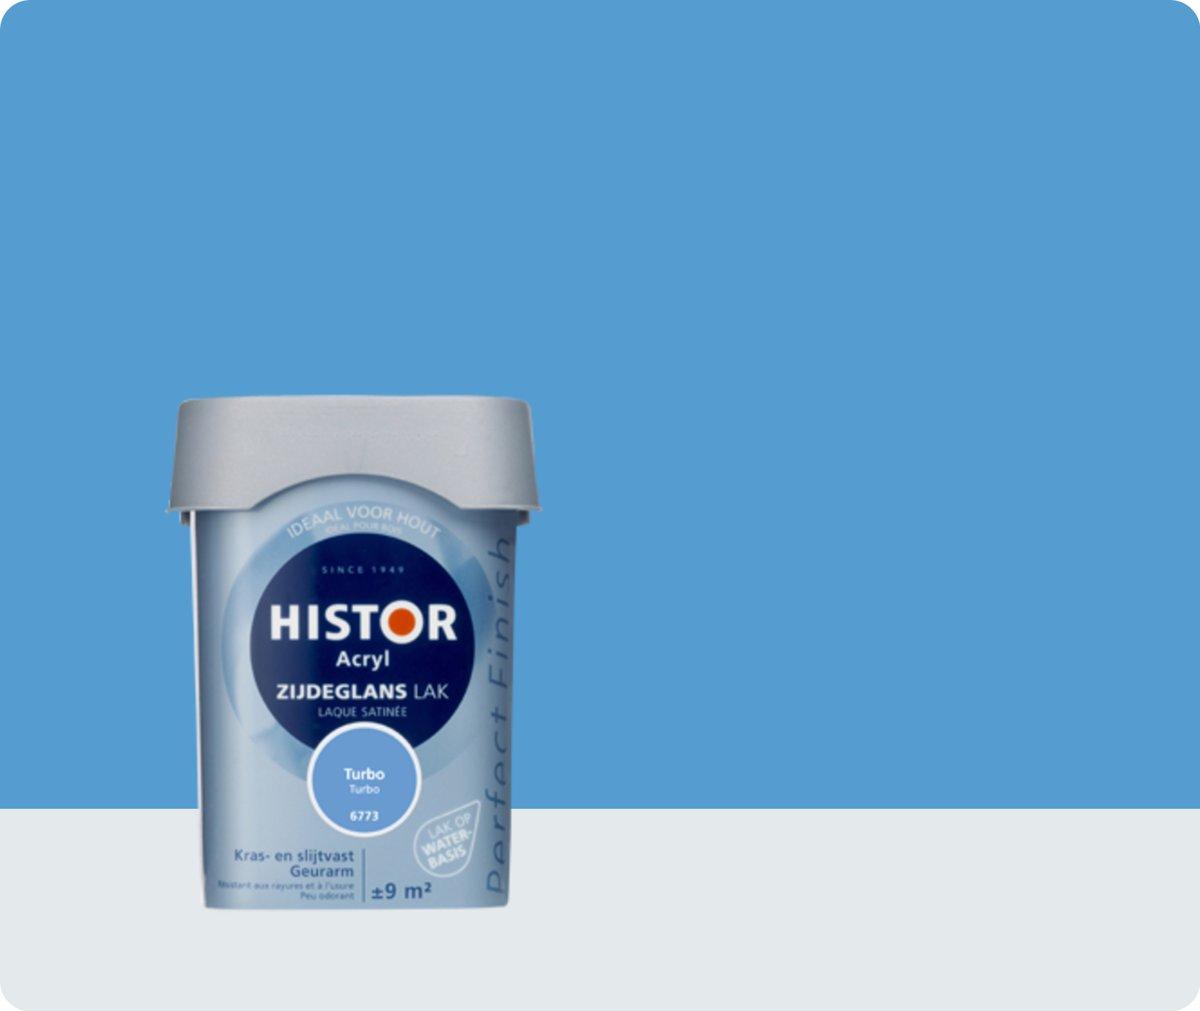 Histor Perfect Finish Lak Acryl Zijdeglans 0,75 liter - Turbo